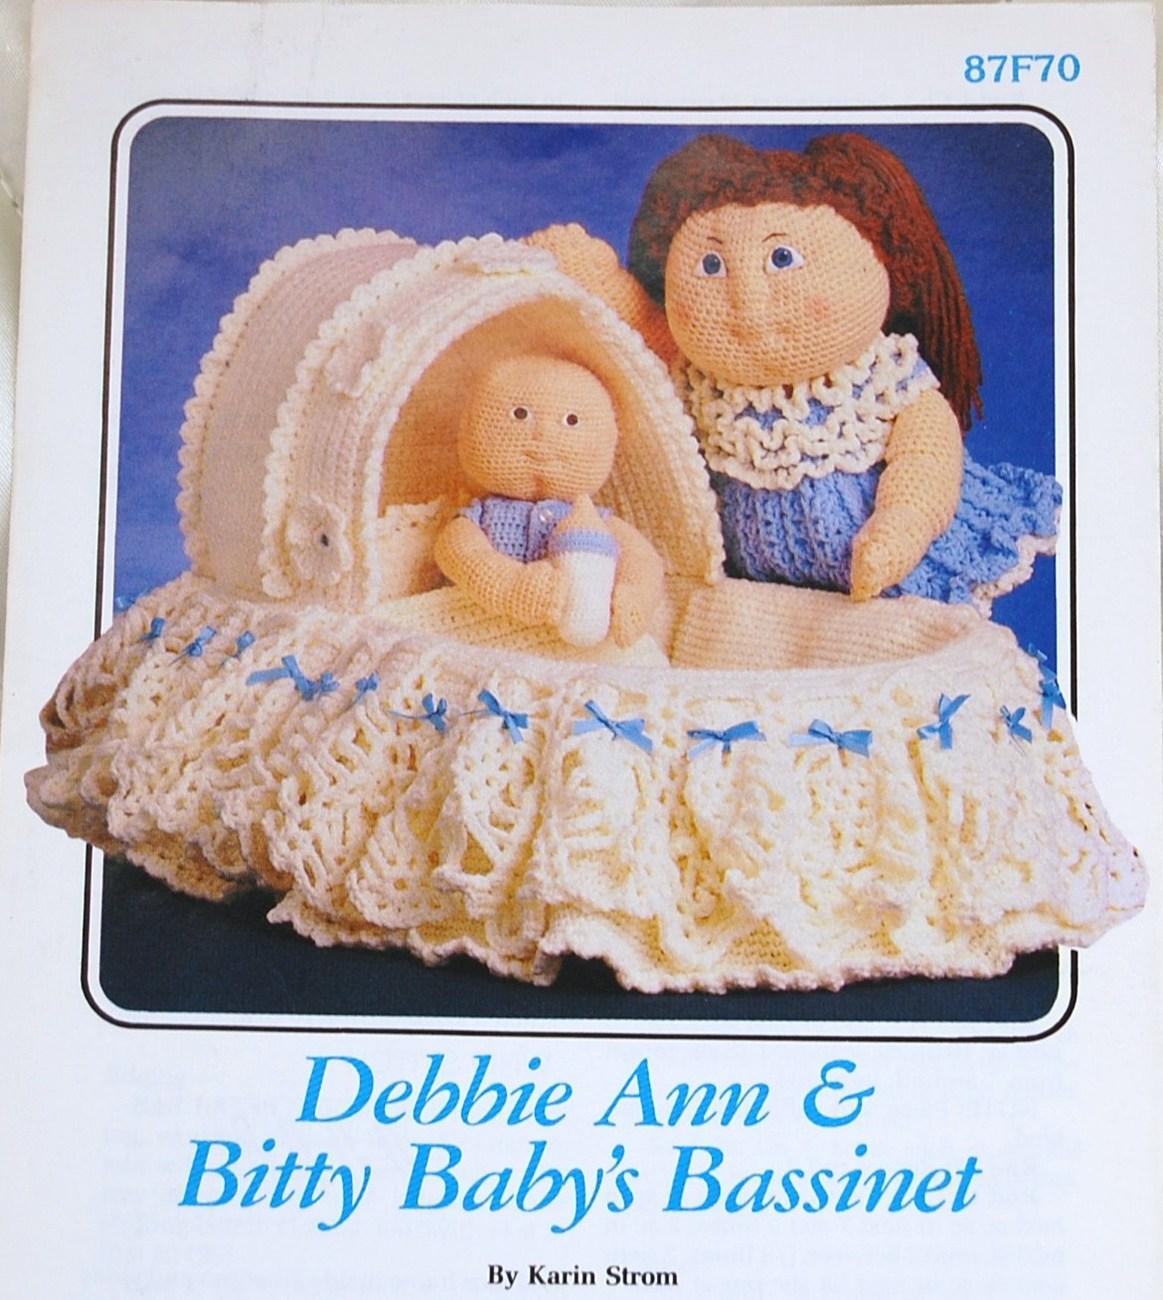 Debbie Ann & Bitty Baby\'s Bassinet Crochet and 46 similar items